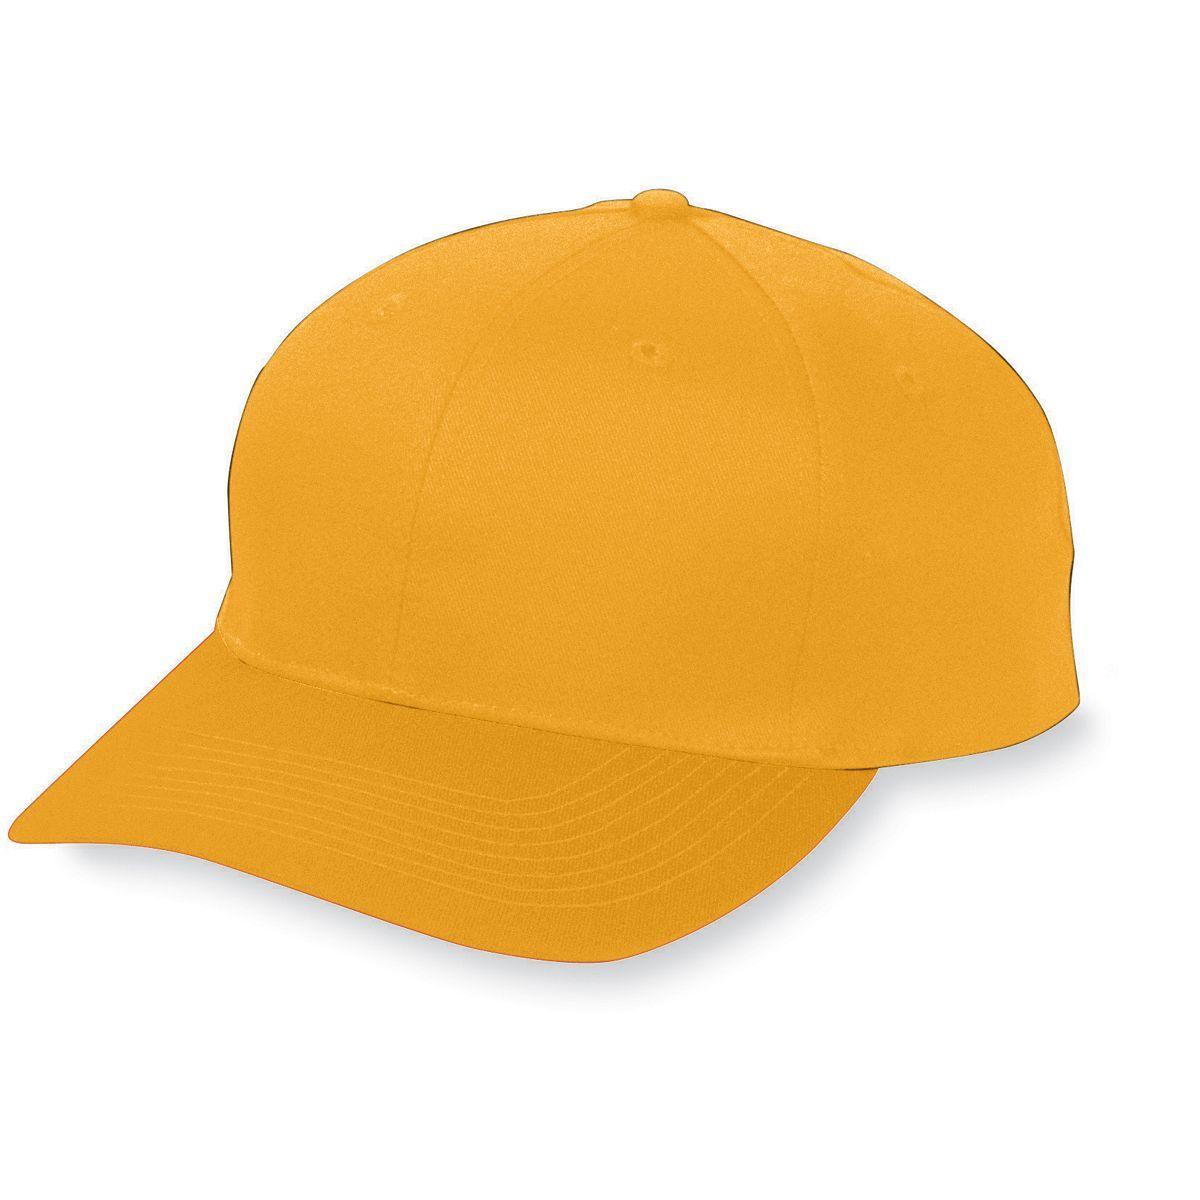 Six-Panel Cotton Twill Low-Profile Cap - GOLD